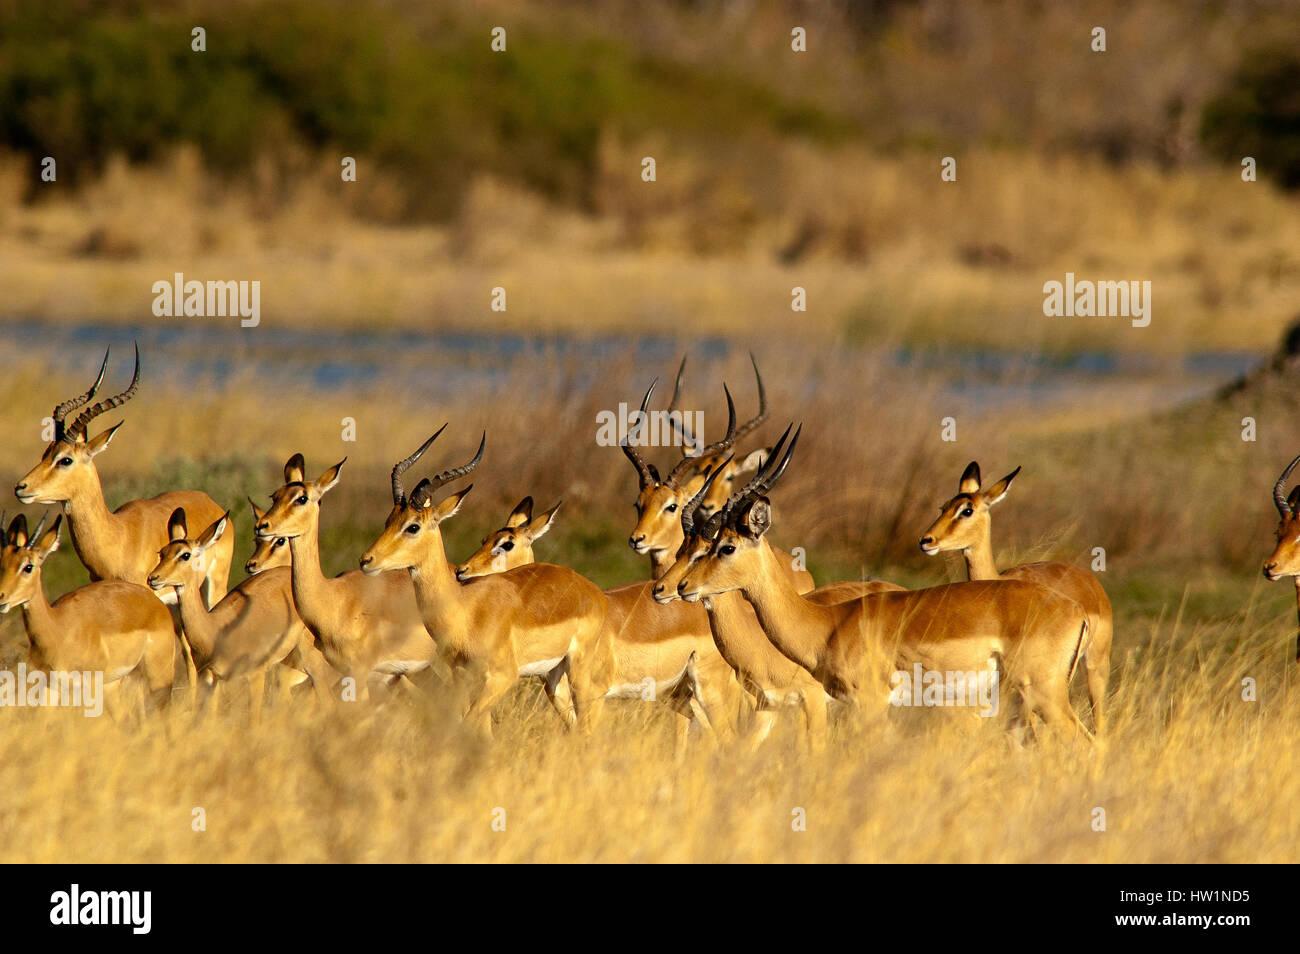 Herd of impalas at Deception Valley, Central Kalahari National Park, Botswana - Stock Image